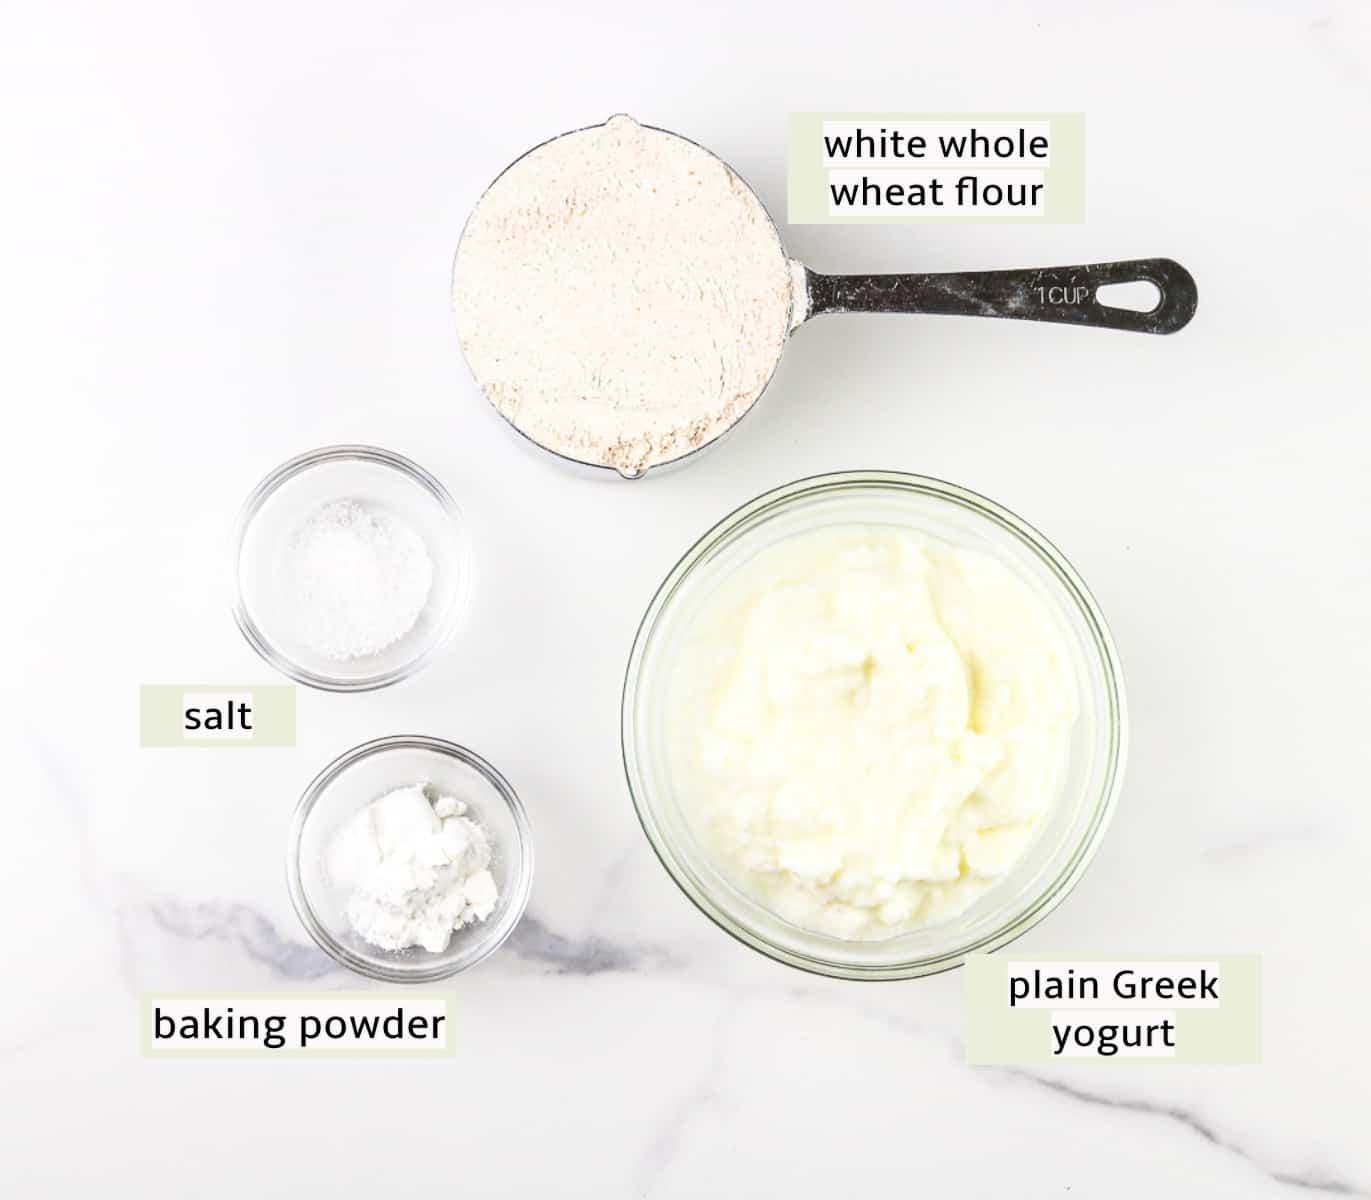 Image of ingredients for mini bagel recipe.